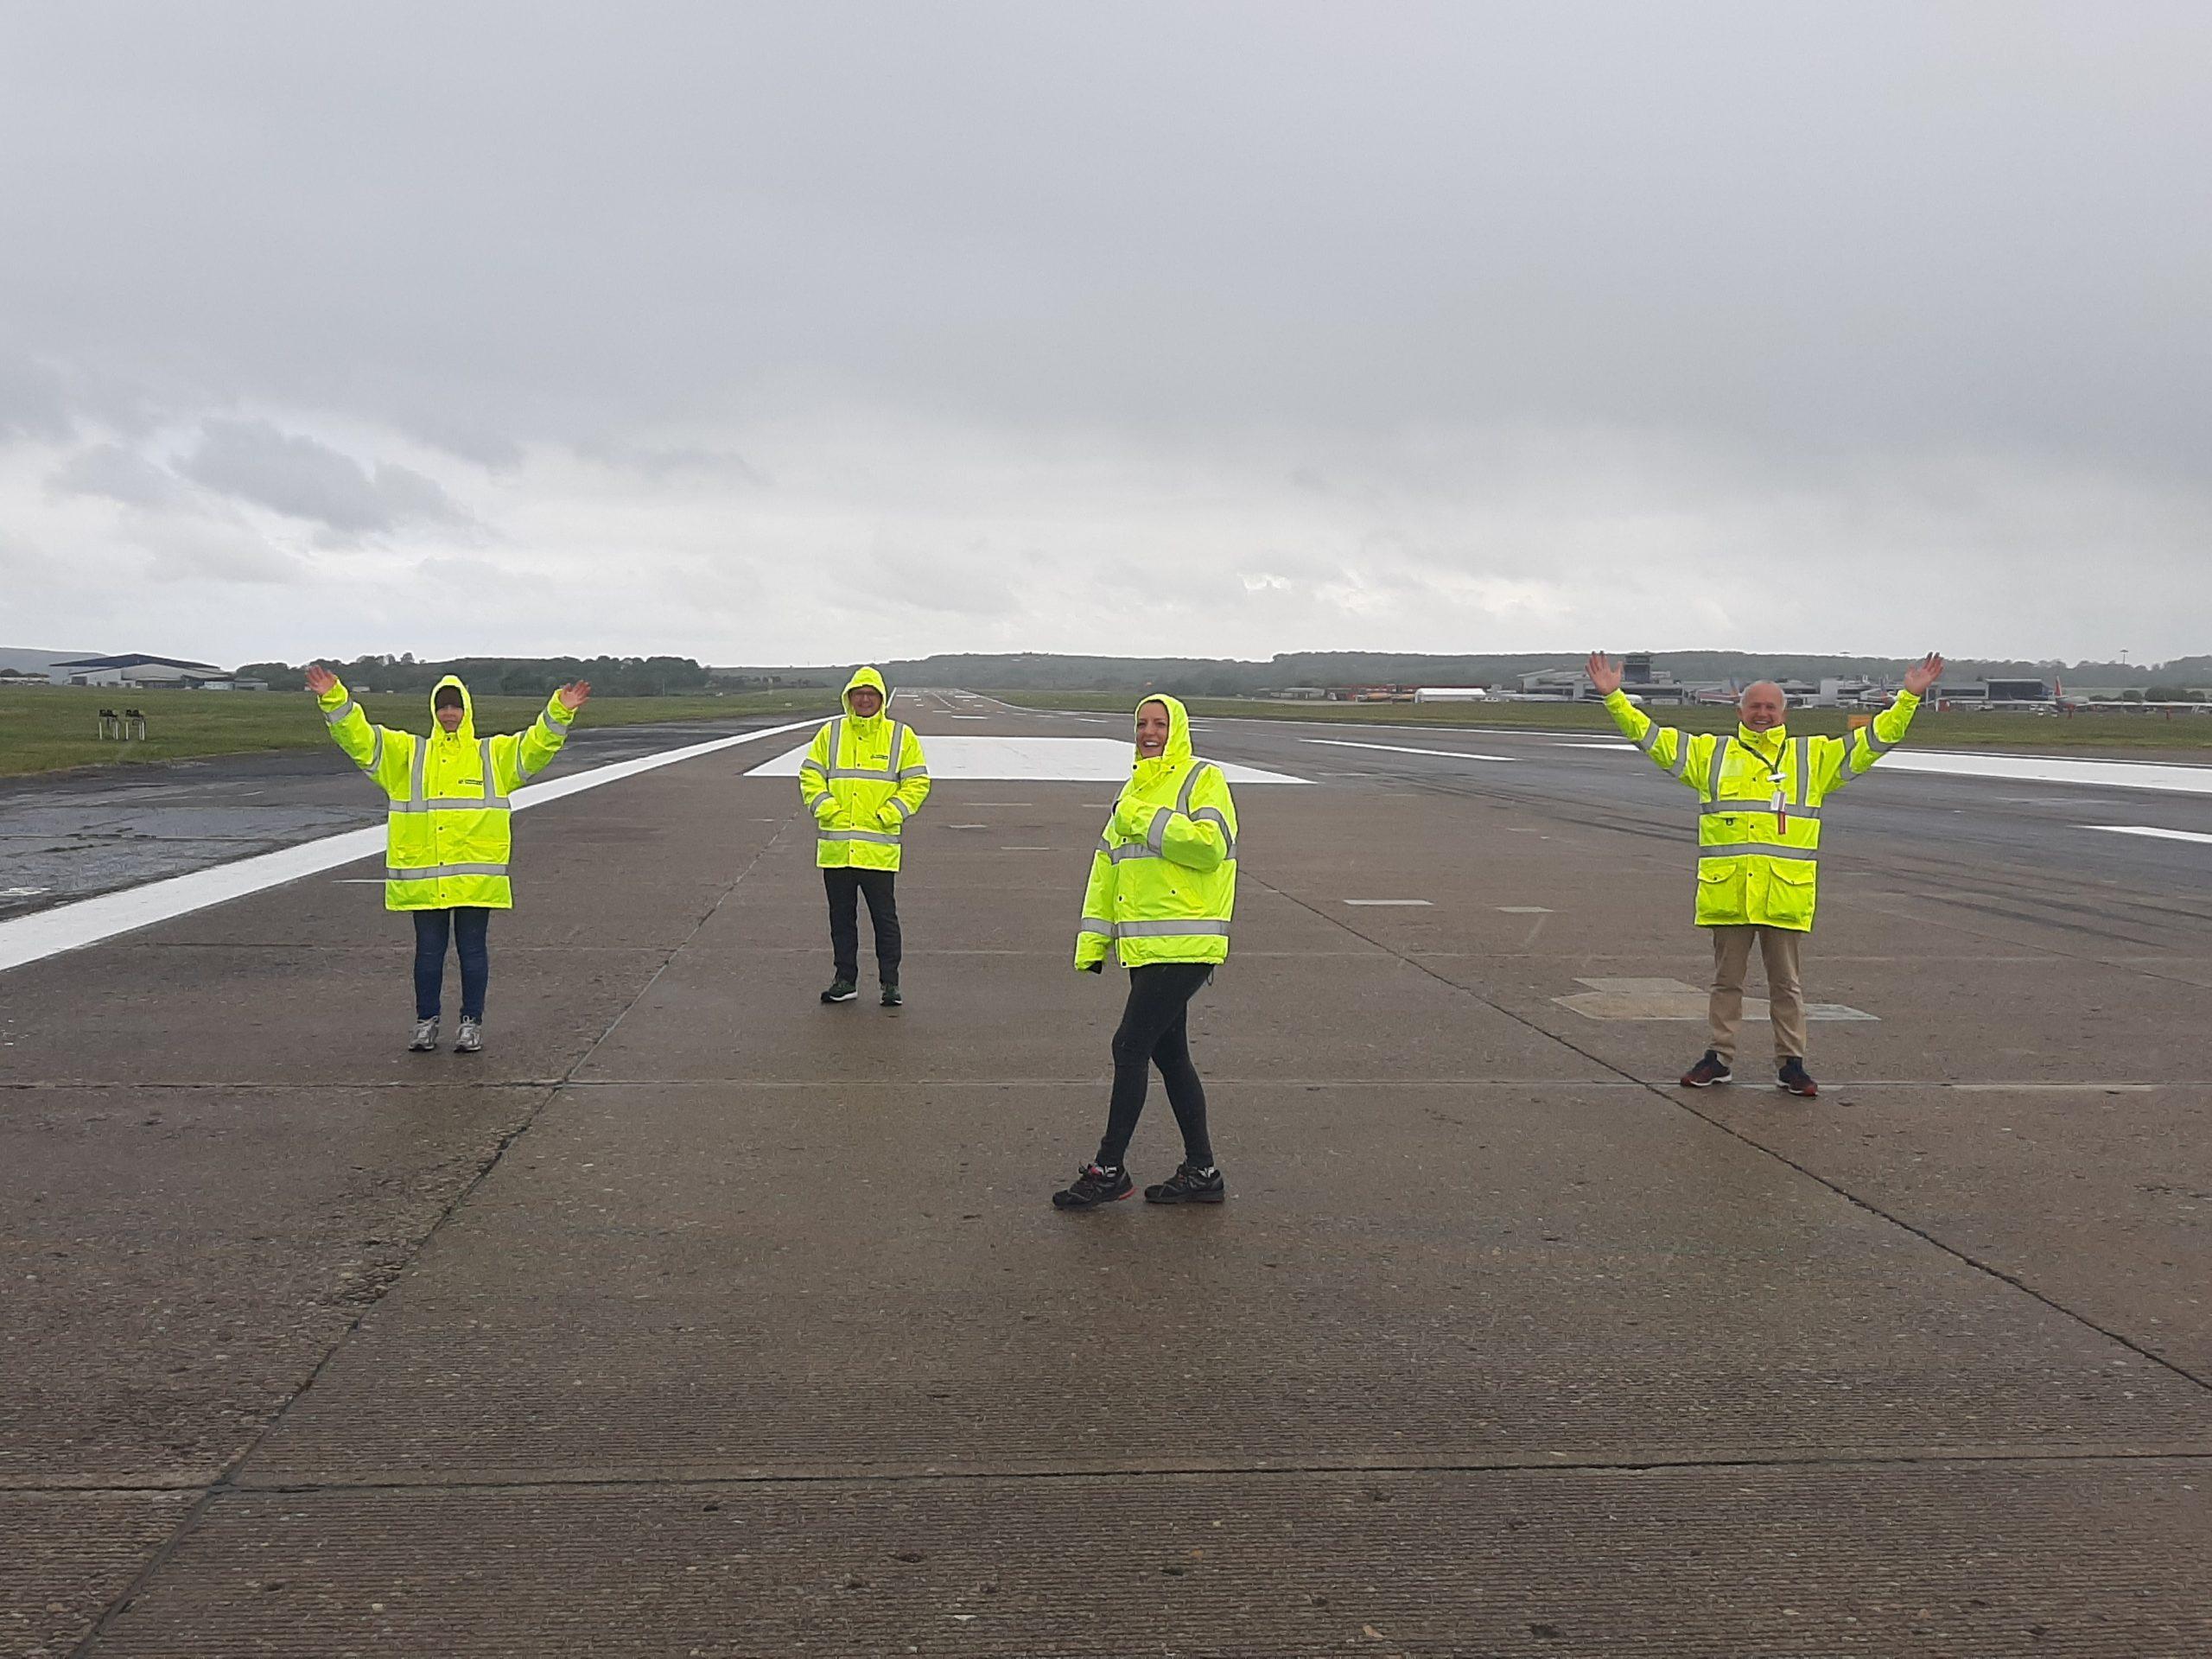 Staff at Leeds Bradford Airport